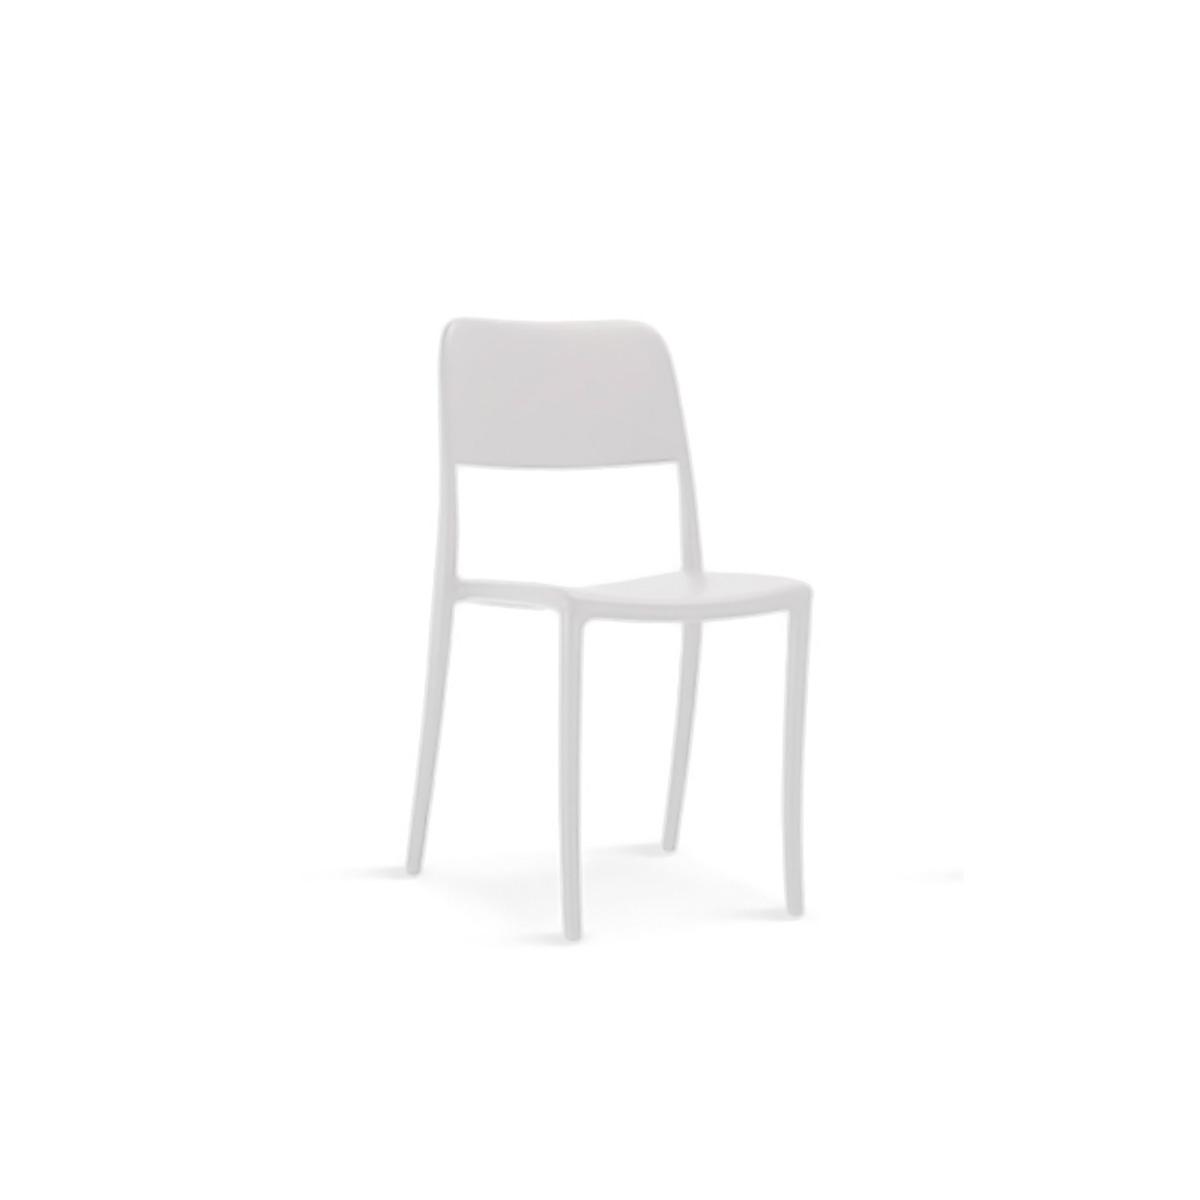 Stolica bela MH-2048